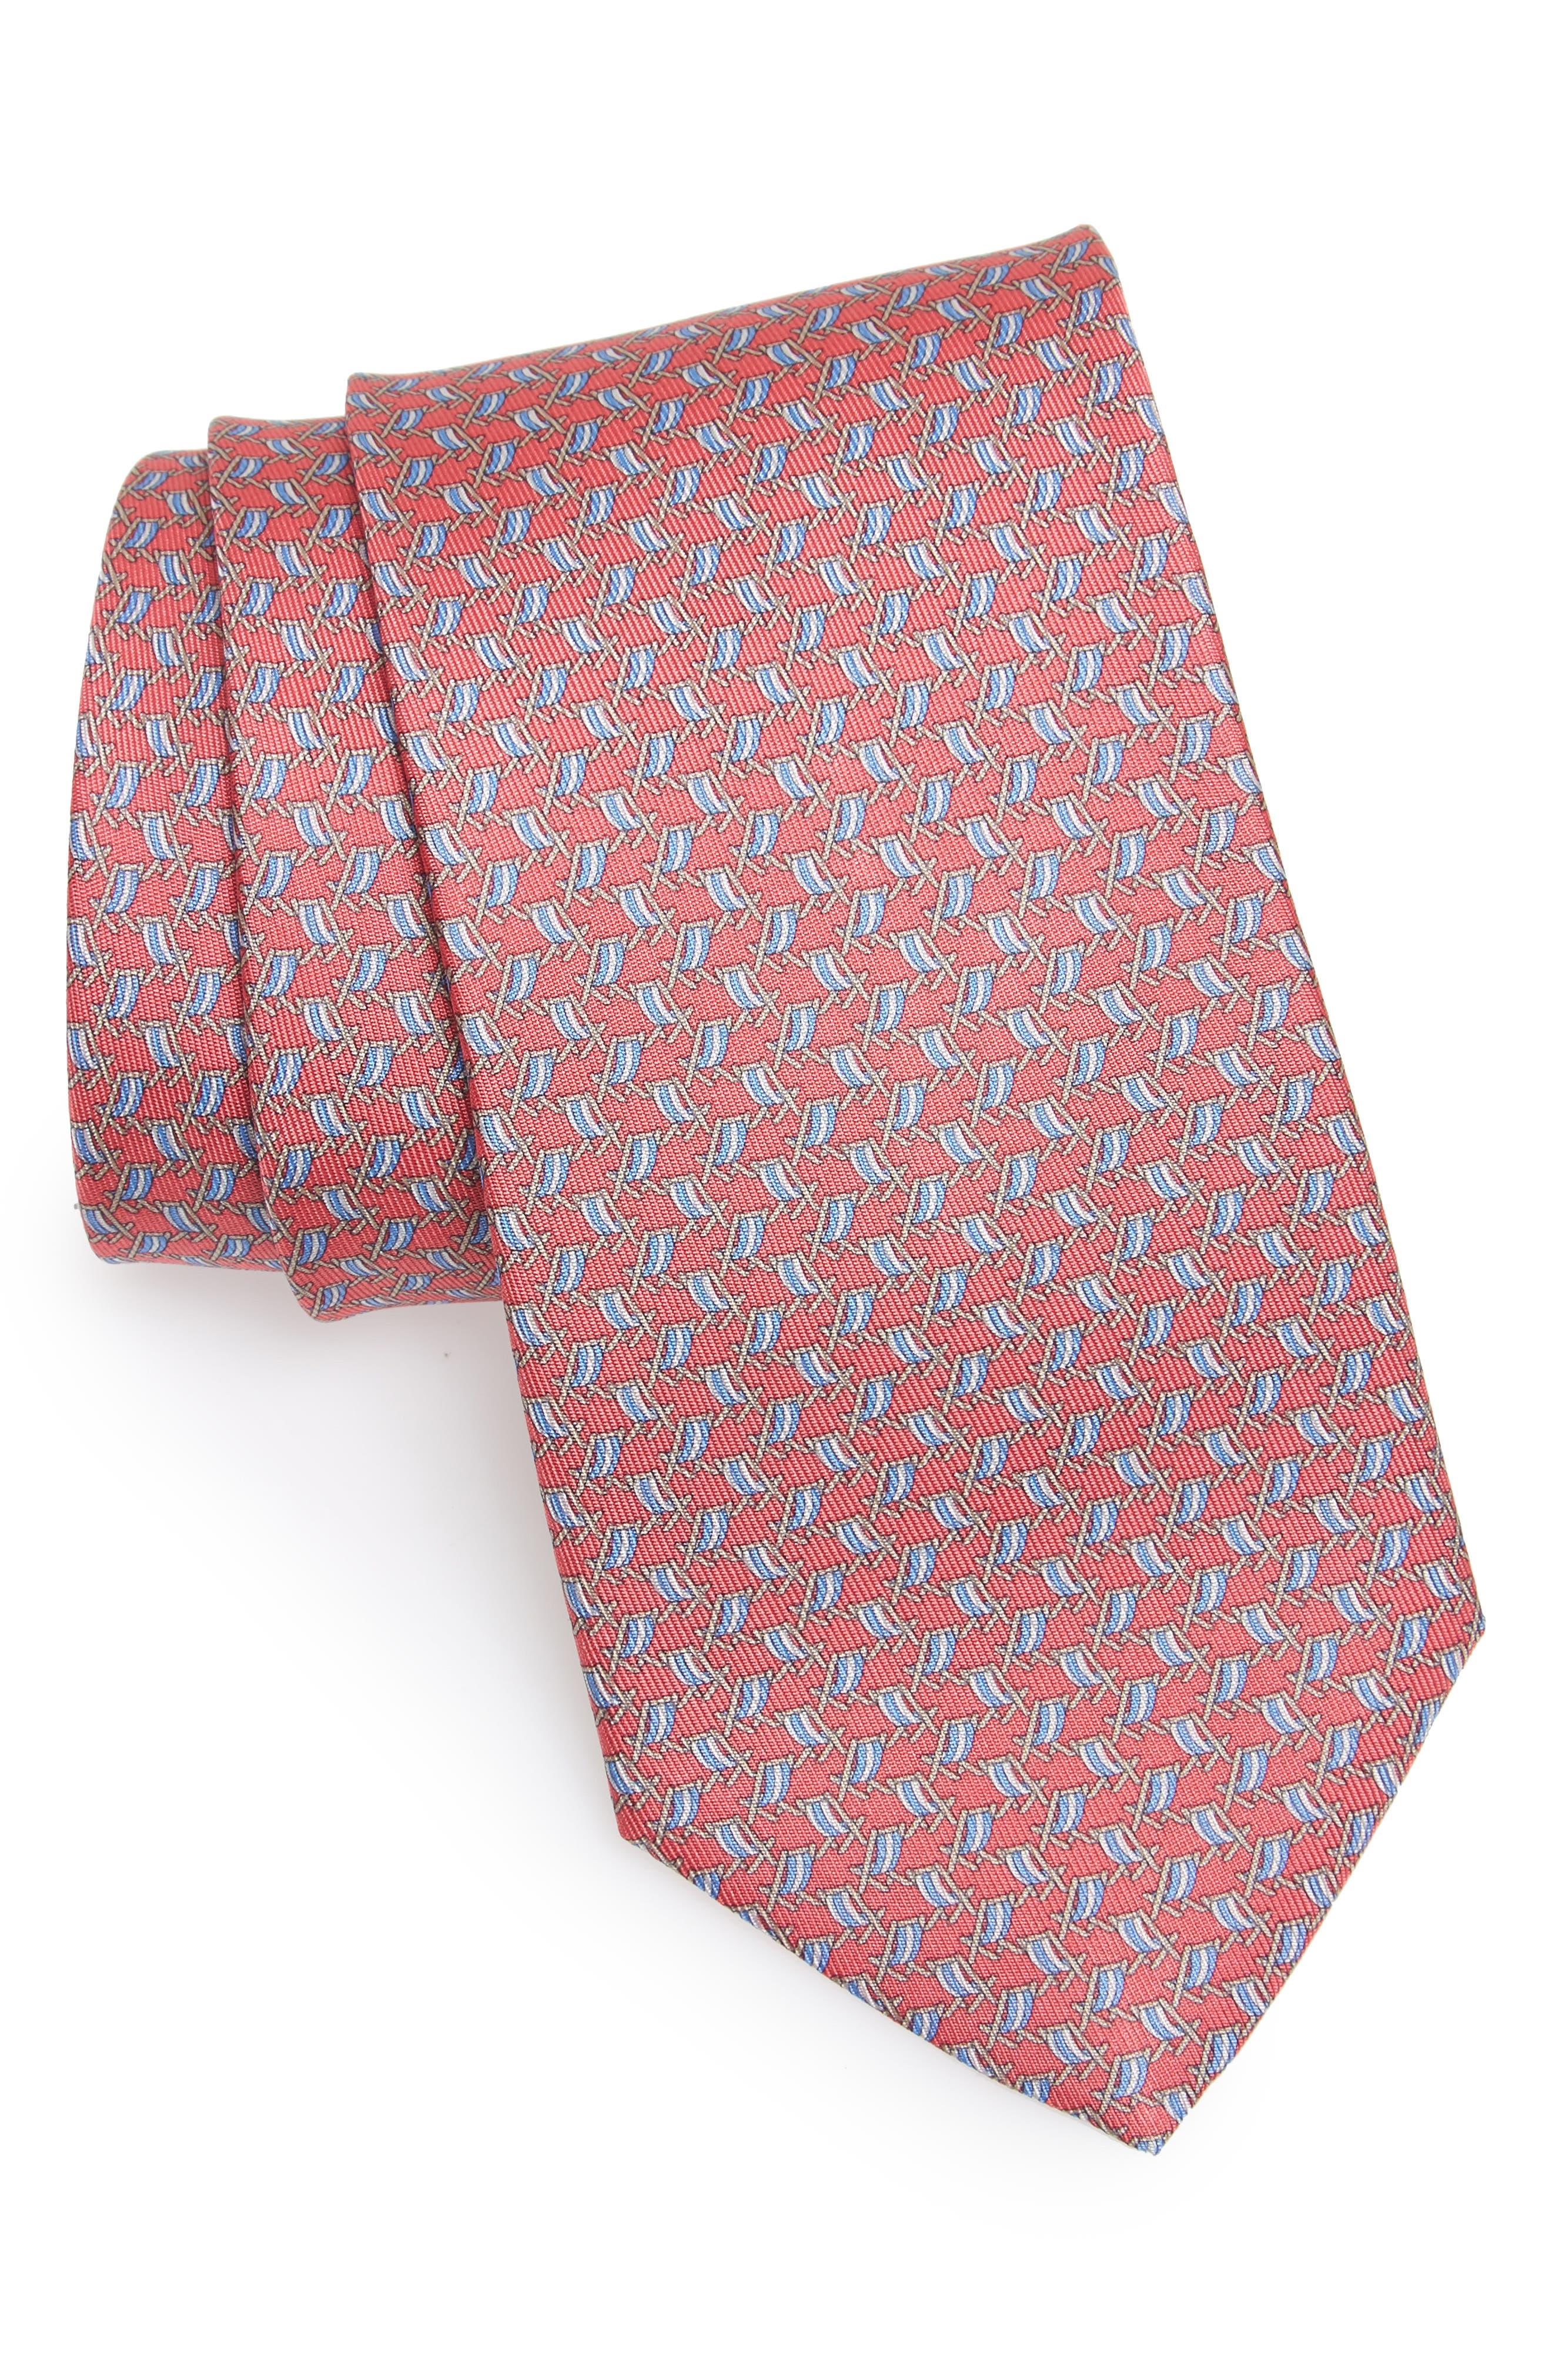 Salvatore Ferragamo Ersilia Print Silk Tie